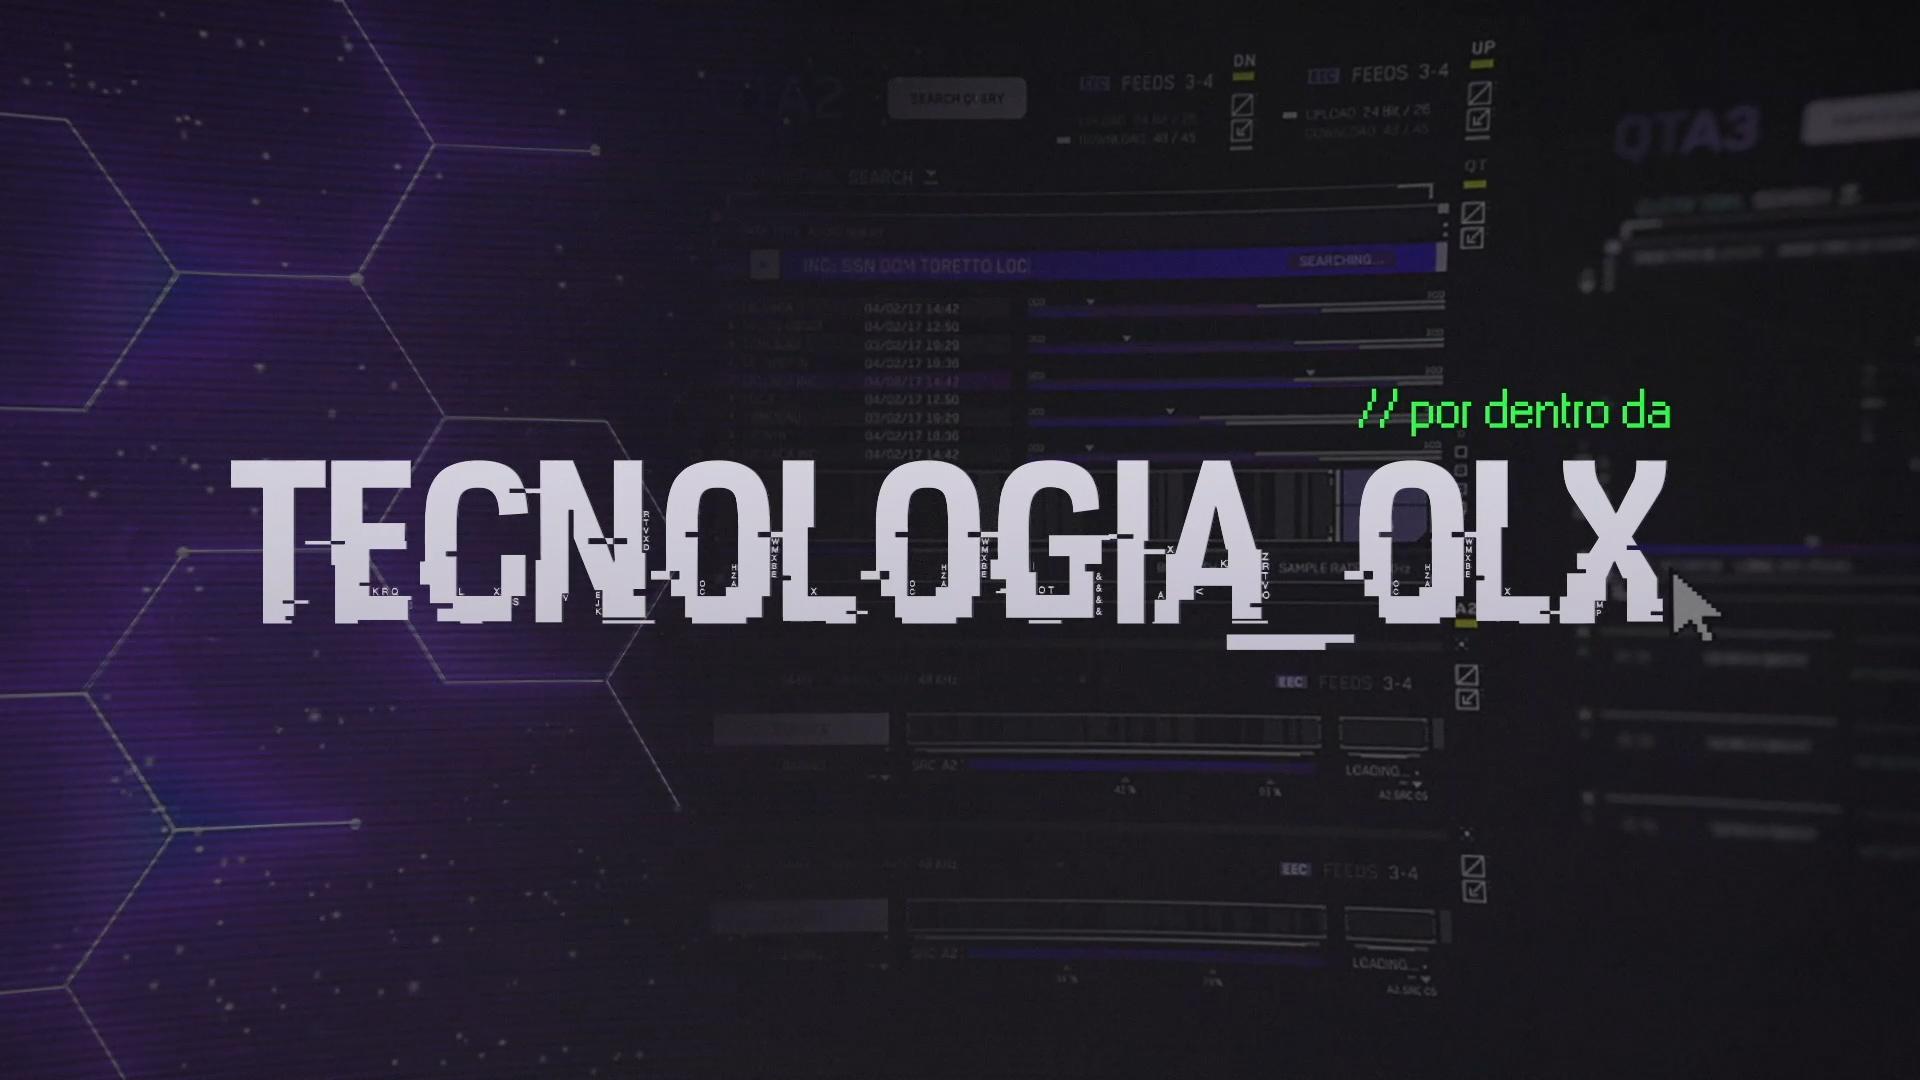 Tecnologia OLX